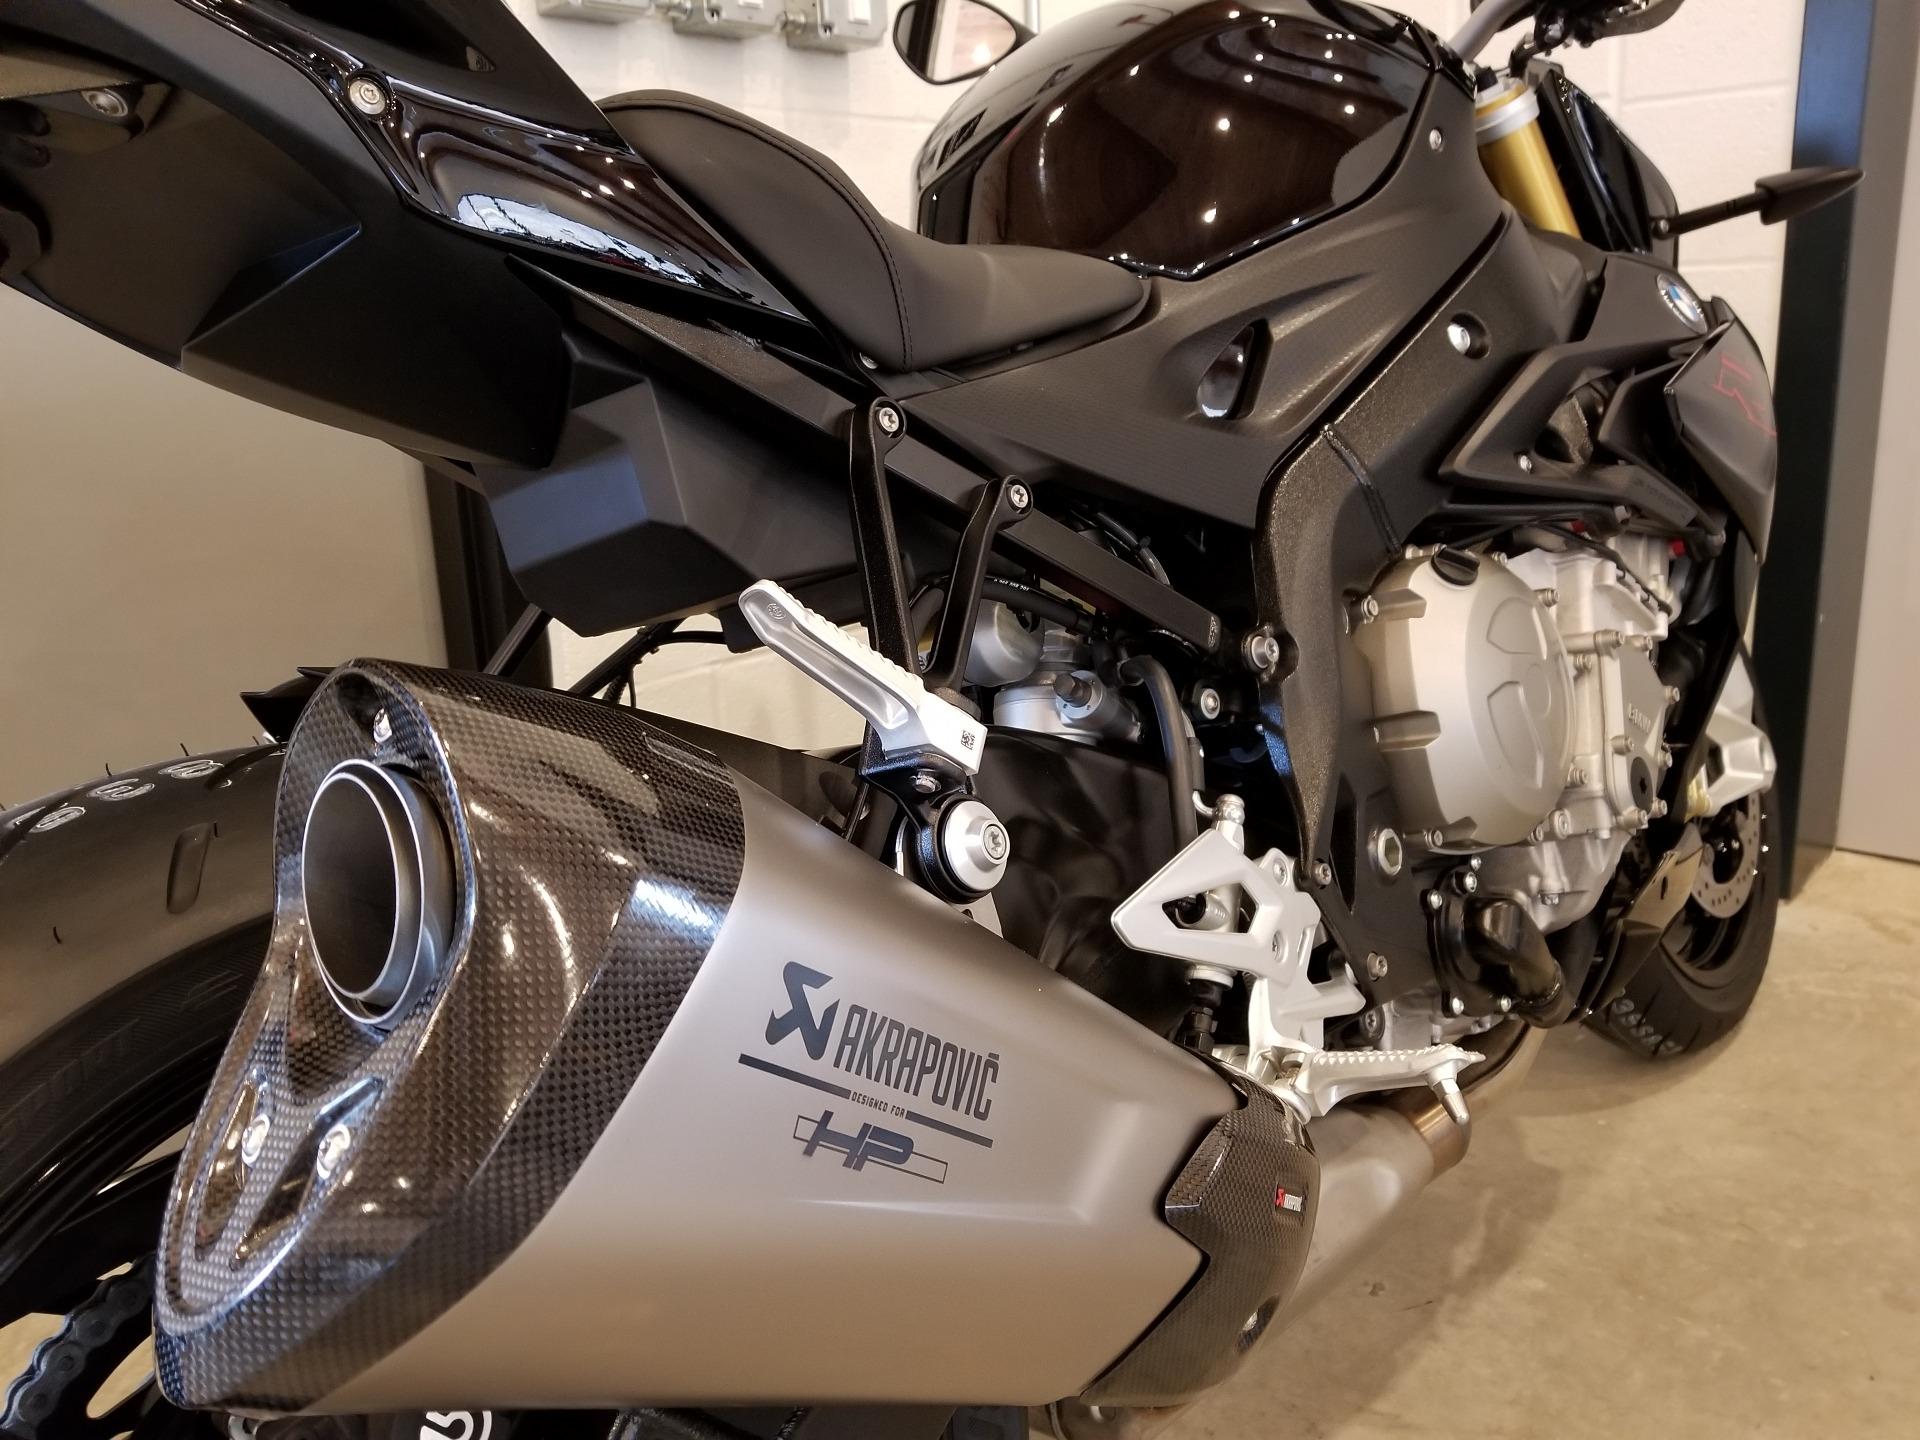 2019 Bmw S 1000 R Motorcycles Port Clinton Pennsylvania